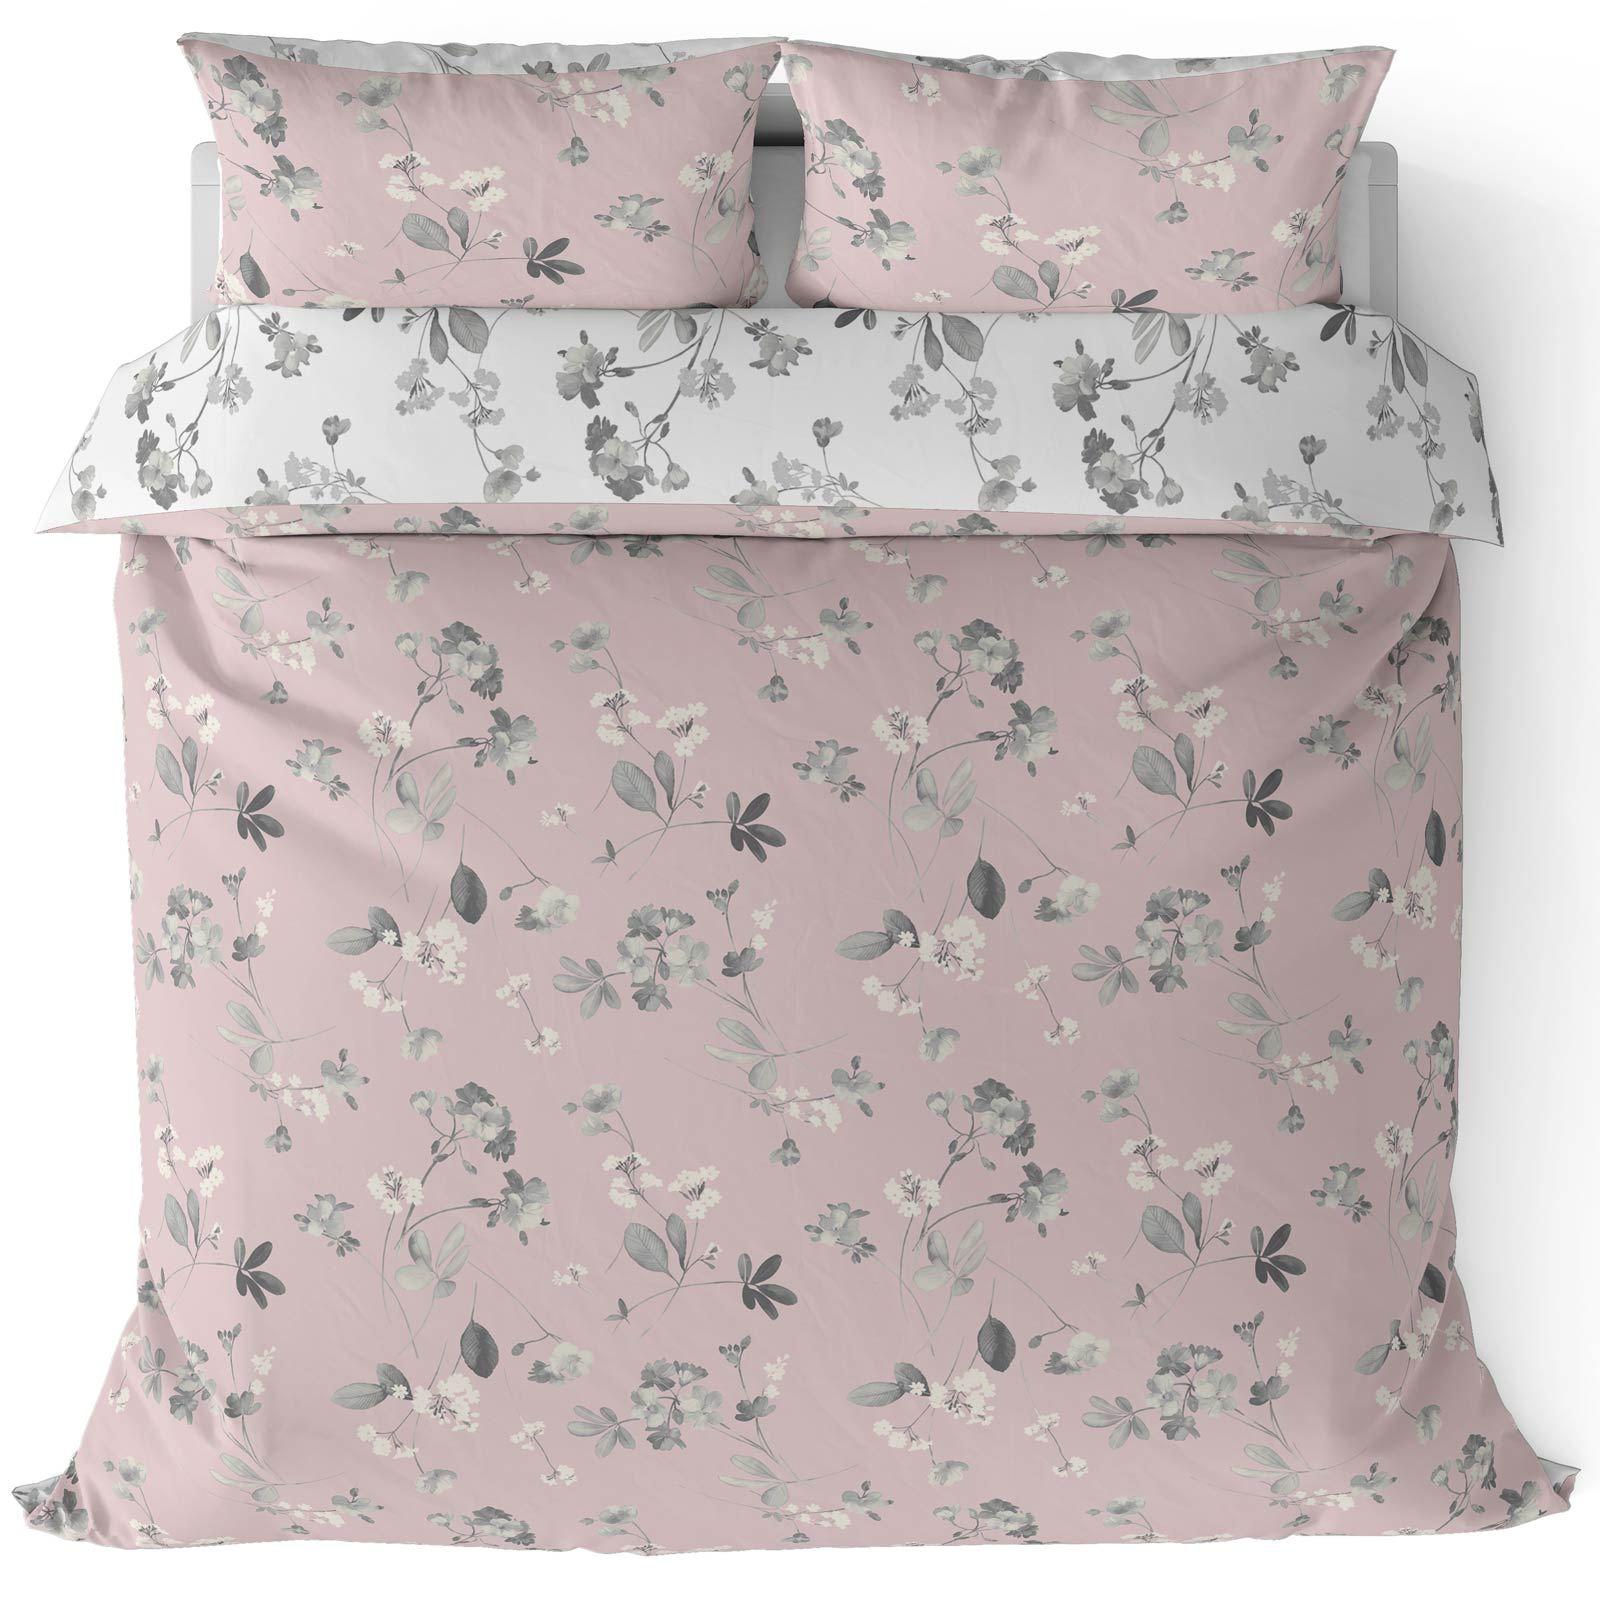 Cubierta-Edredon-Rosa-Blush-Rose-Impreso-juego-De-Edredon-Conjuntos-de-Cama-cubre-Jacquard miniatura 40